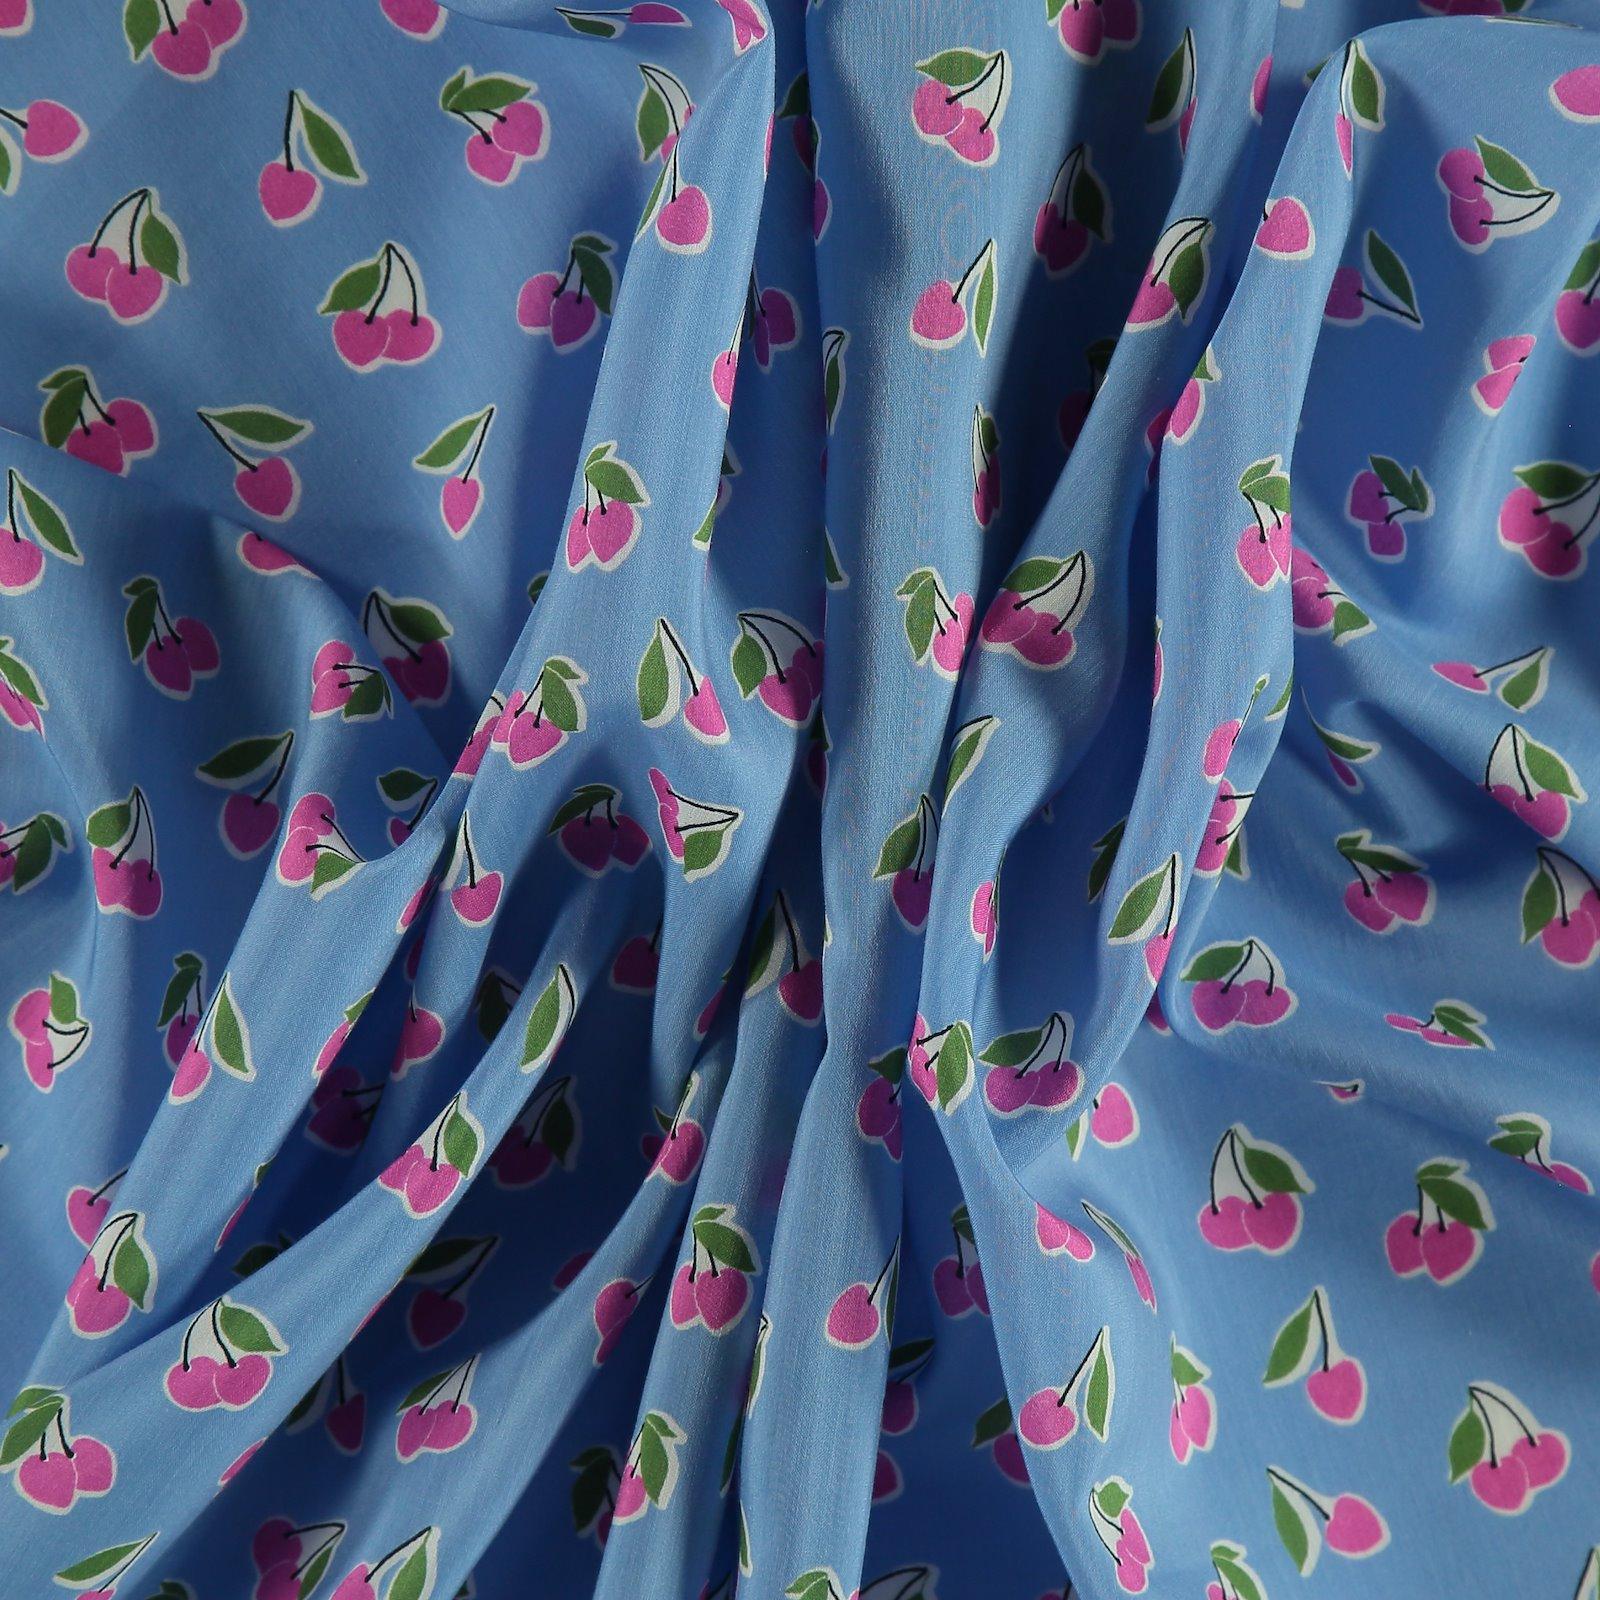 Cotton/viscose cobalt blue with cherry 501874_pack